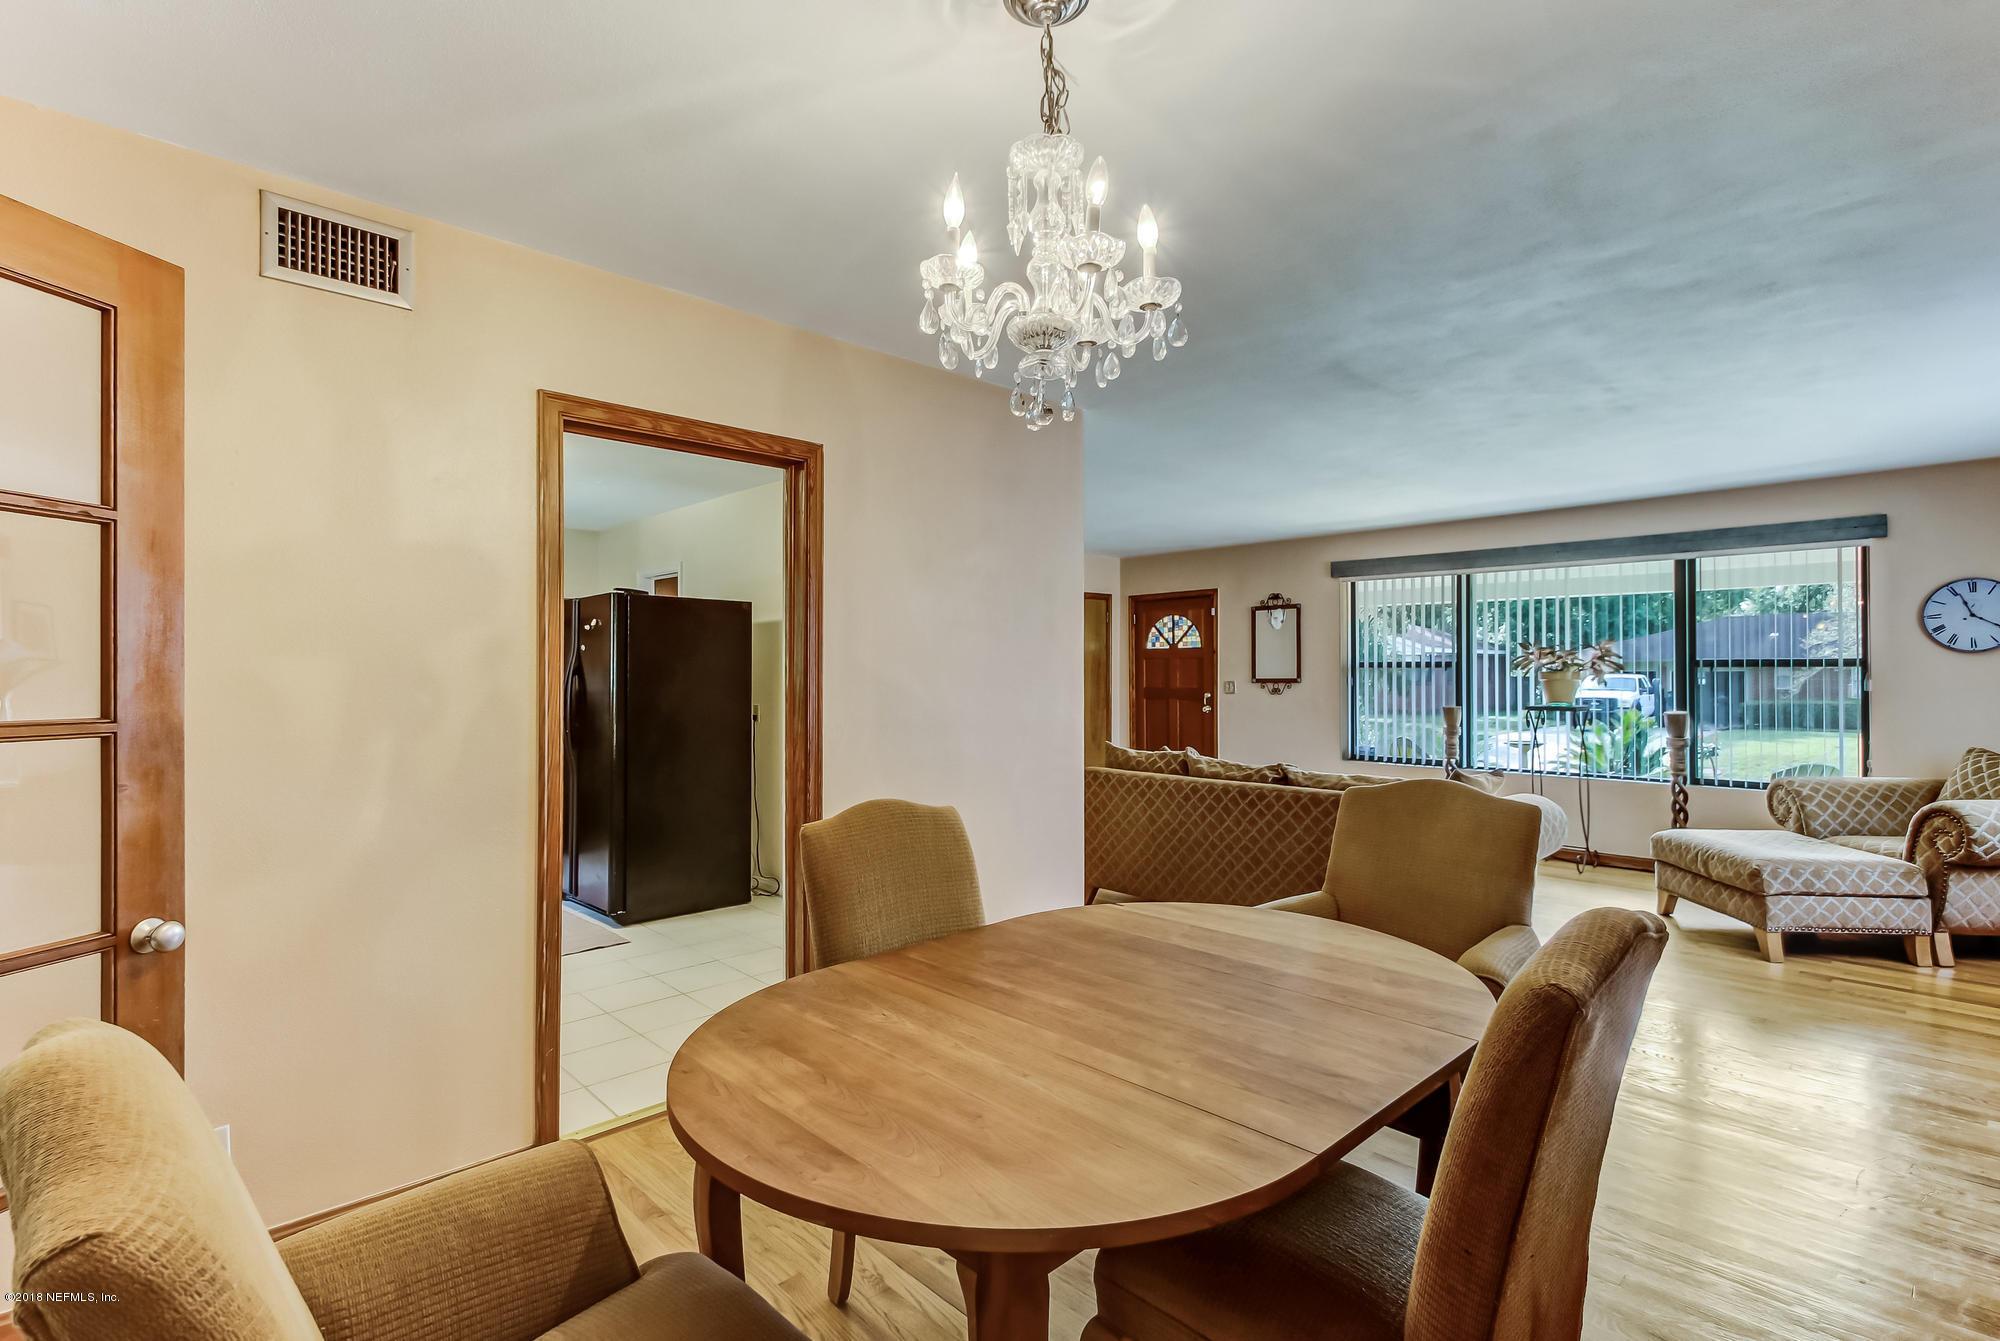 5405 SANTA ROSA, JACKSONVILLE, FLORIDA 32211, 3 Bedrooms Bedrooms, ,2 BathroomsBathrooms,Residential - single family,For sale,SANTA ROSA,965490